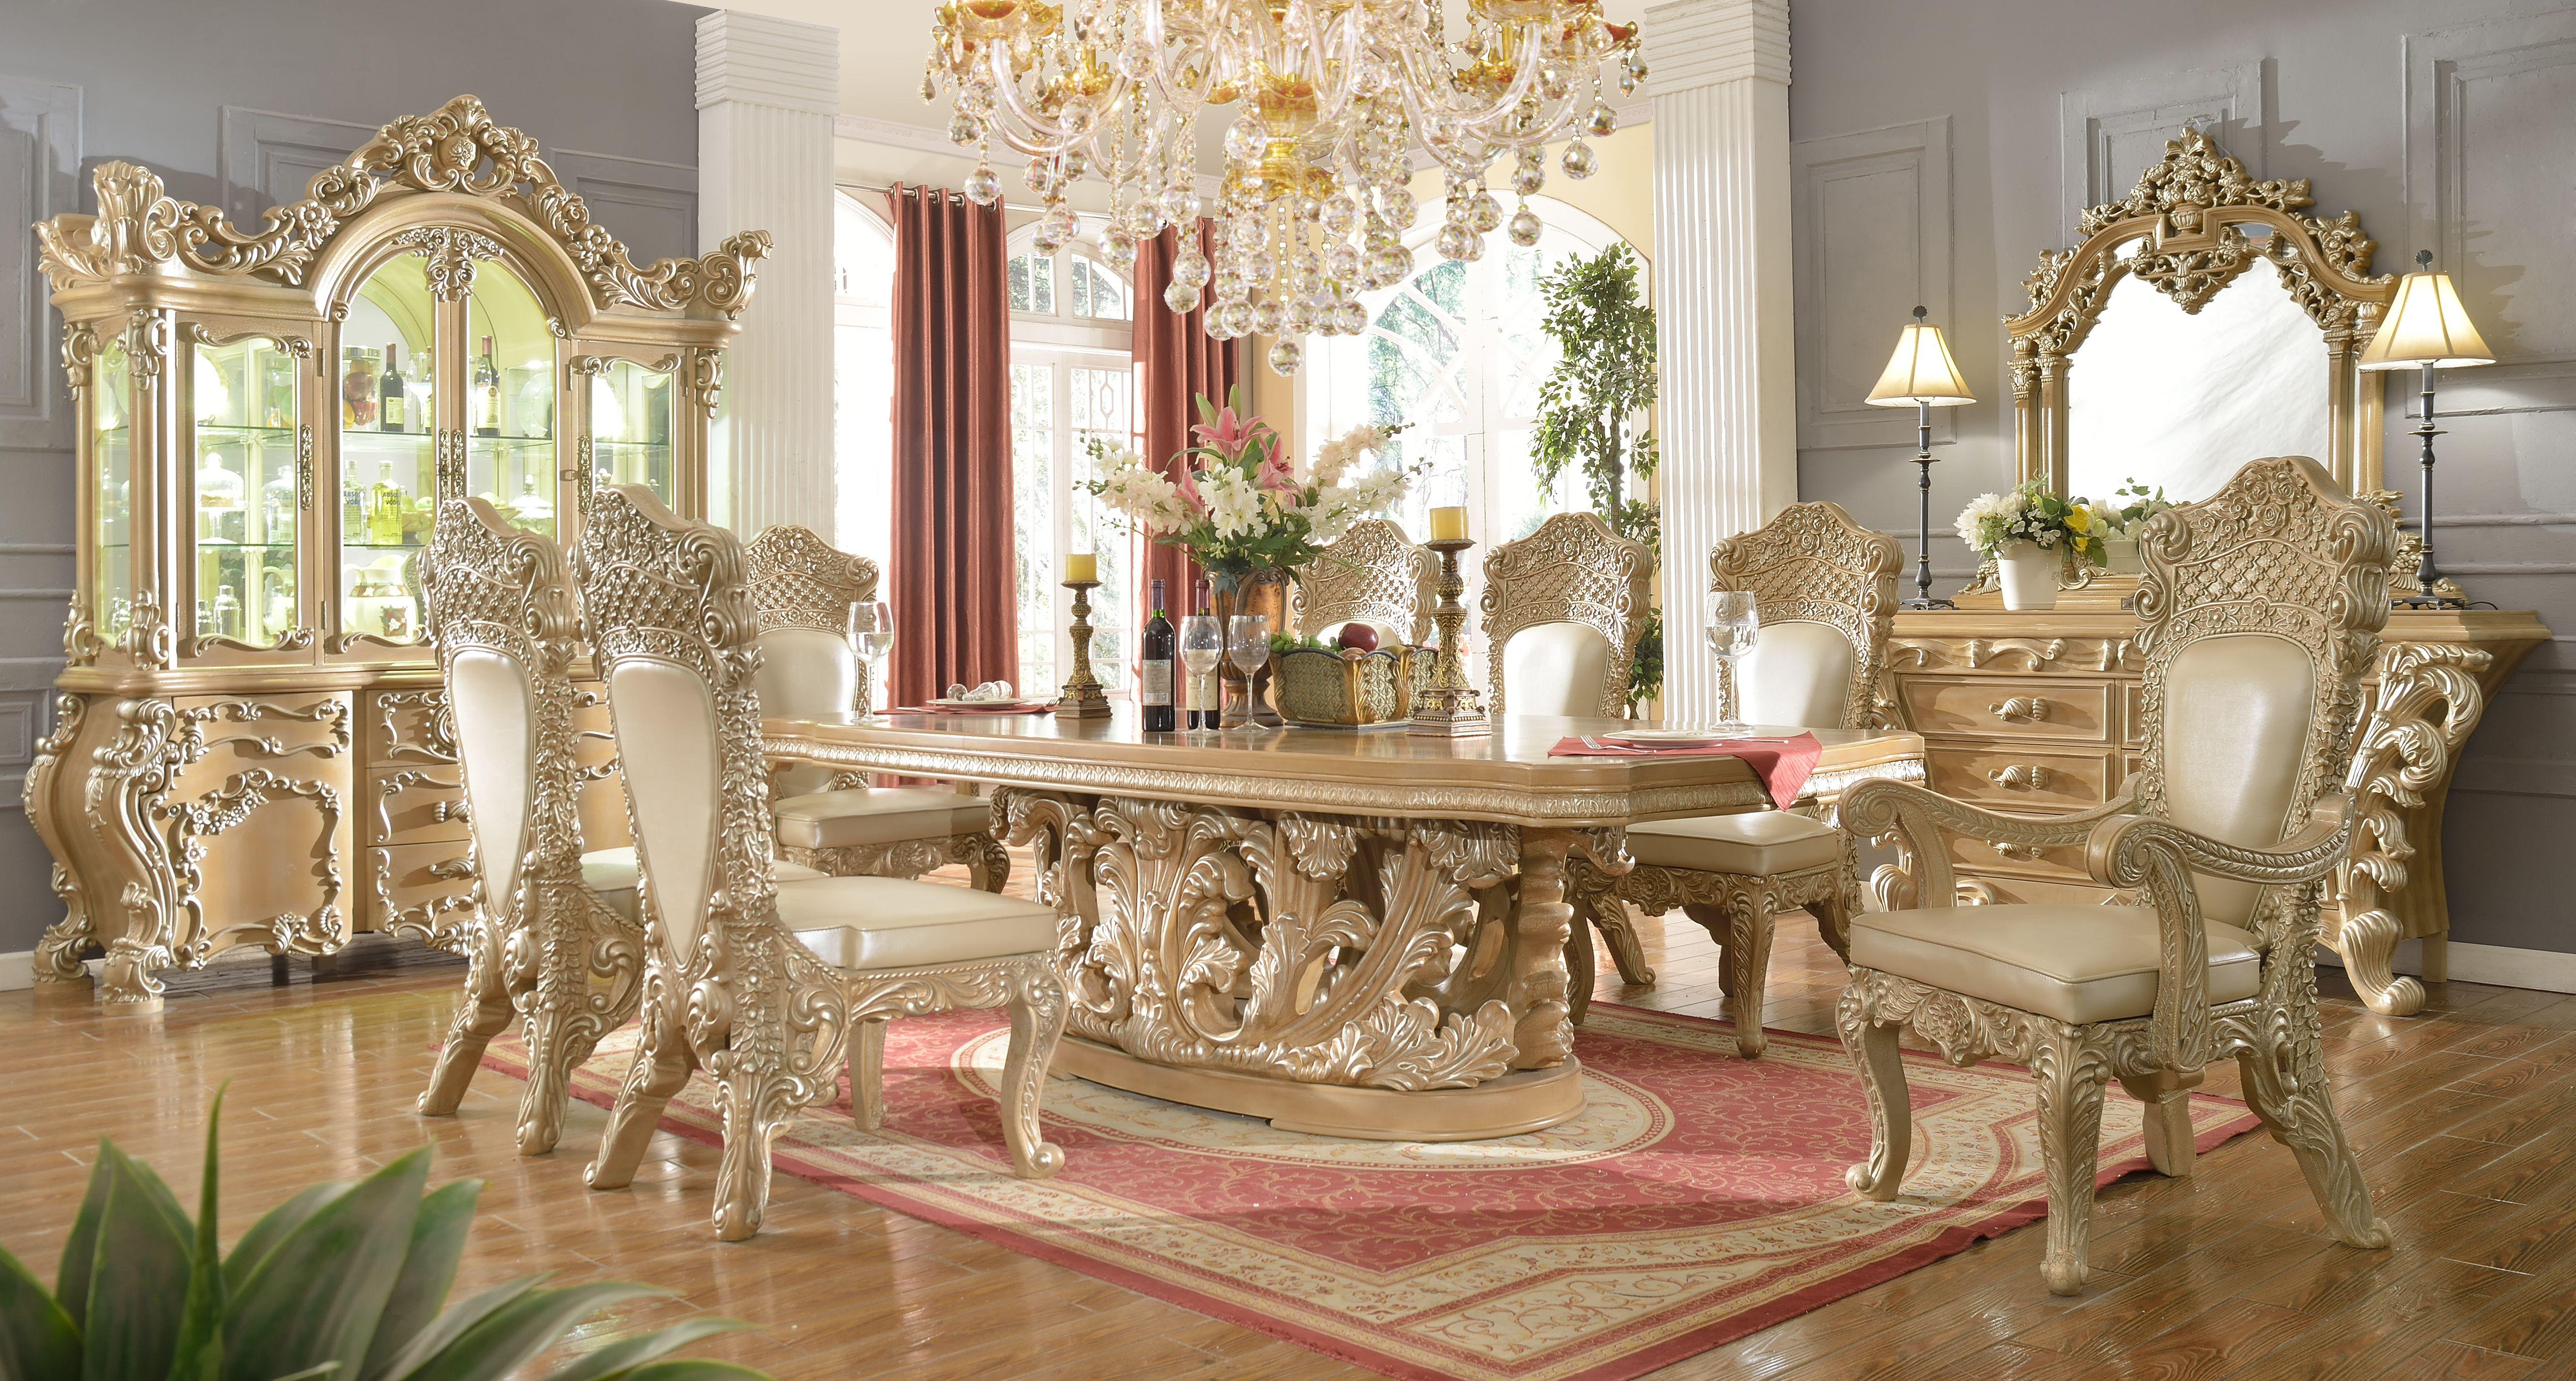 Dining Room Set Hd7012  Antique Recreations  Dininig Room Delectable Antique Formal Dining Room Sets Inspiration Design